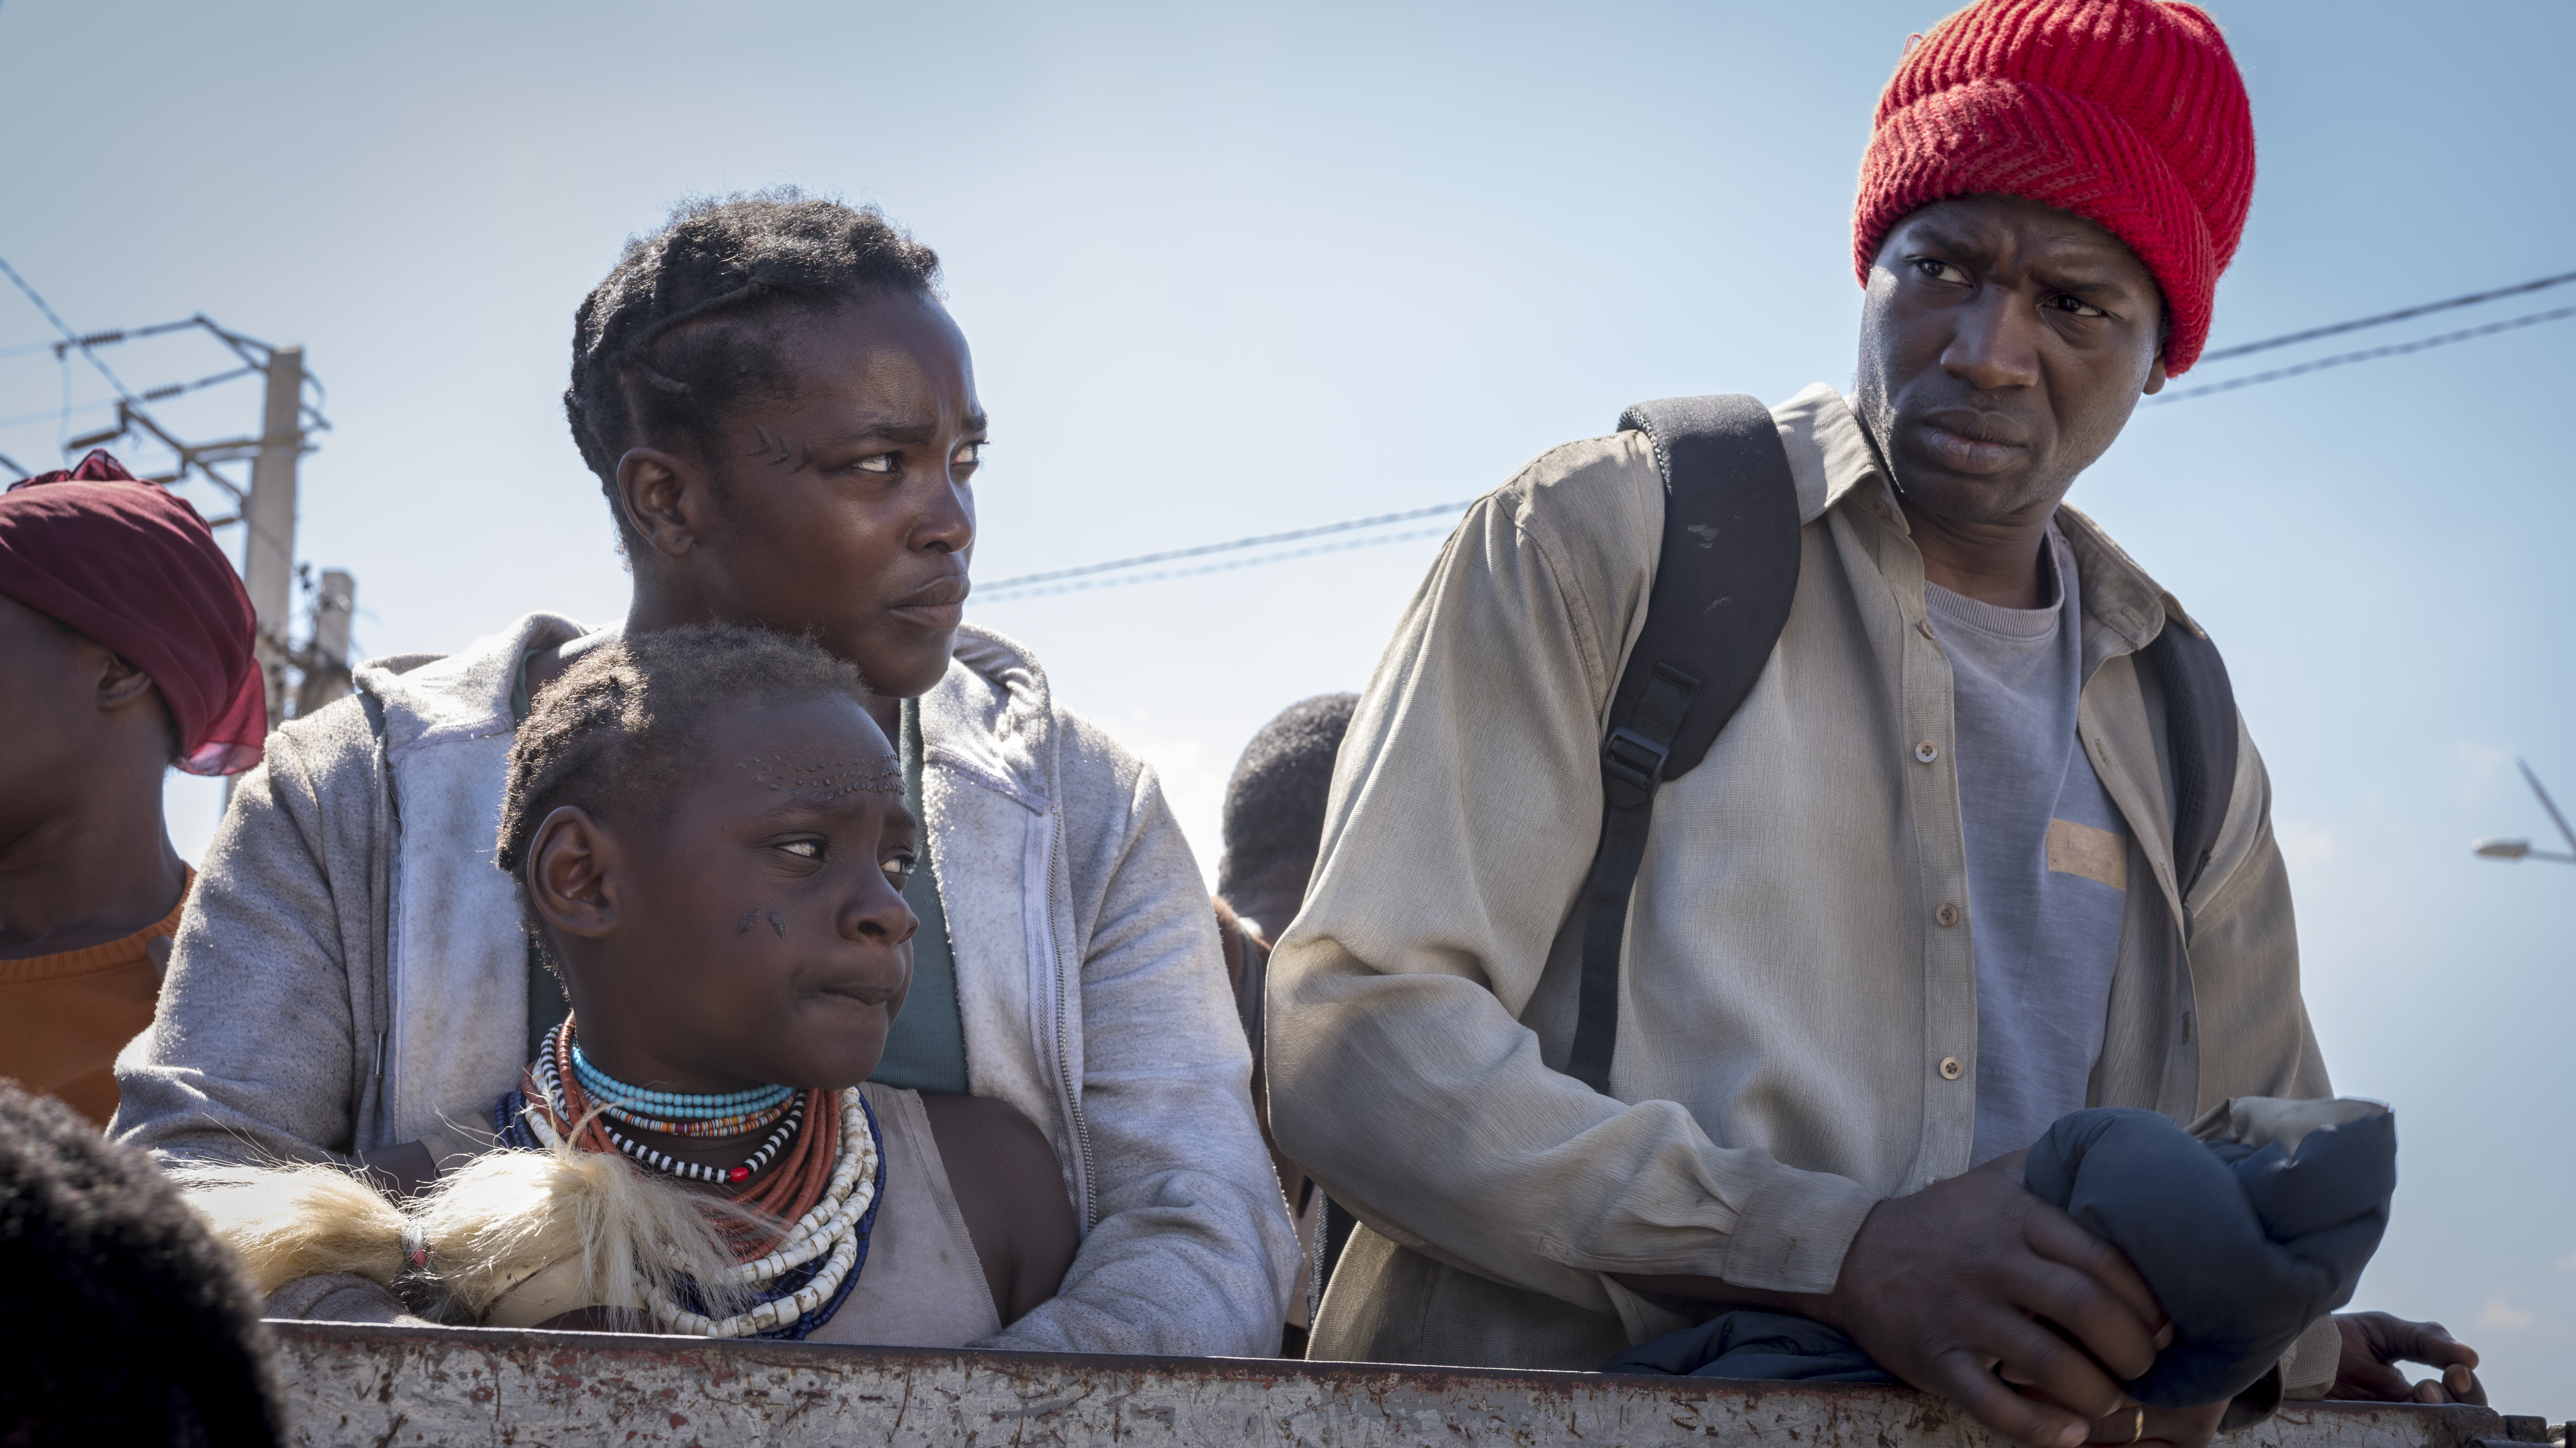 Malaika Wakoli-Abigaba, Wunmi Mosaku, and Sope Dirisu in His House (2020)